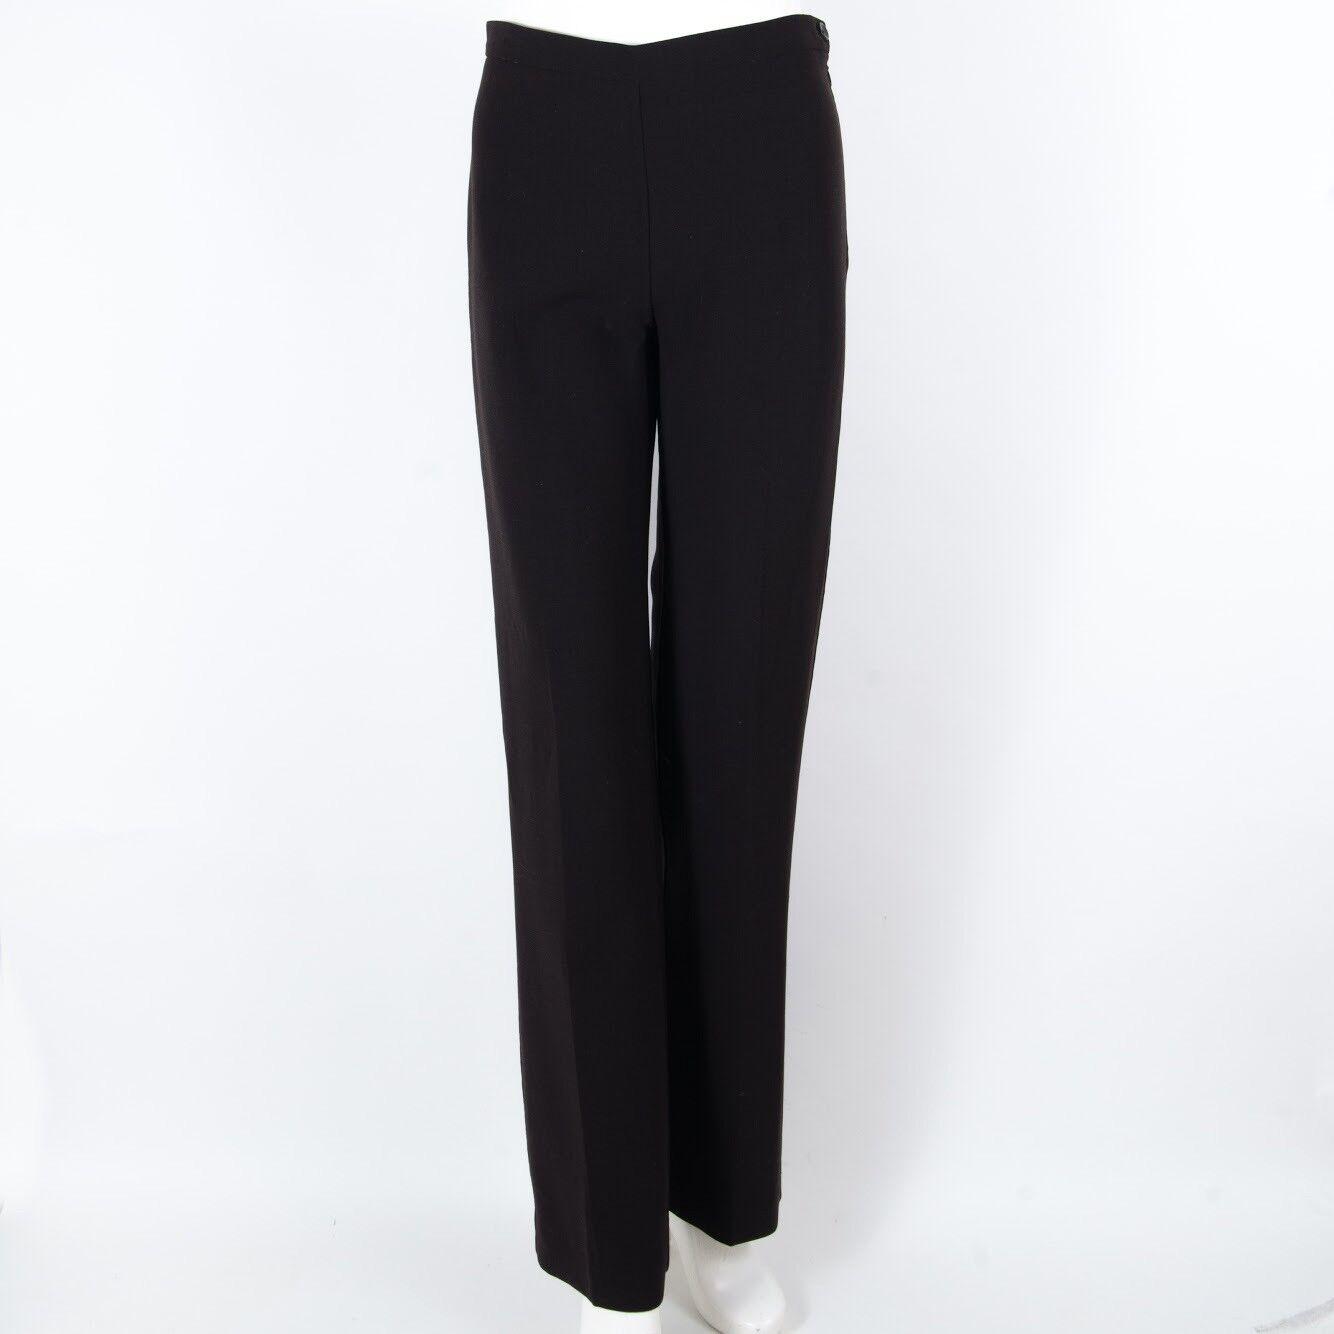 NWT Agnona Pants Dressy Trouser Flat Front Side Zip Dark braun Wool IT 40 US 4